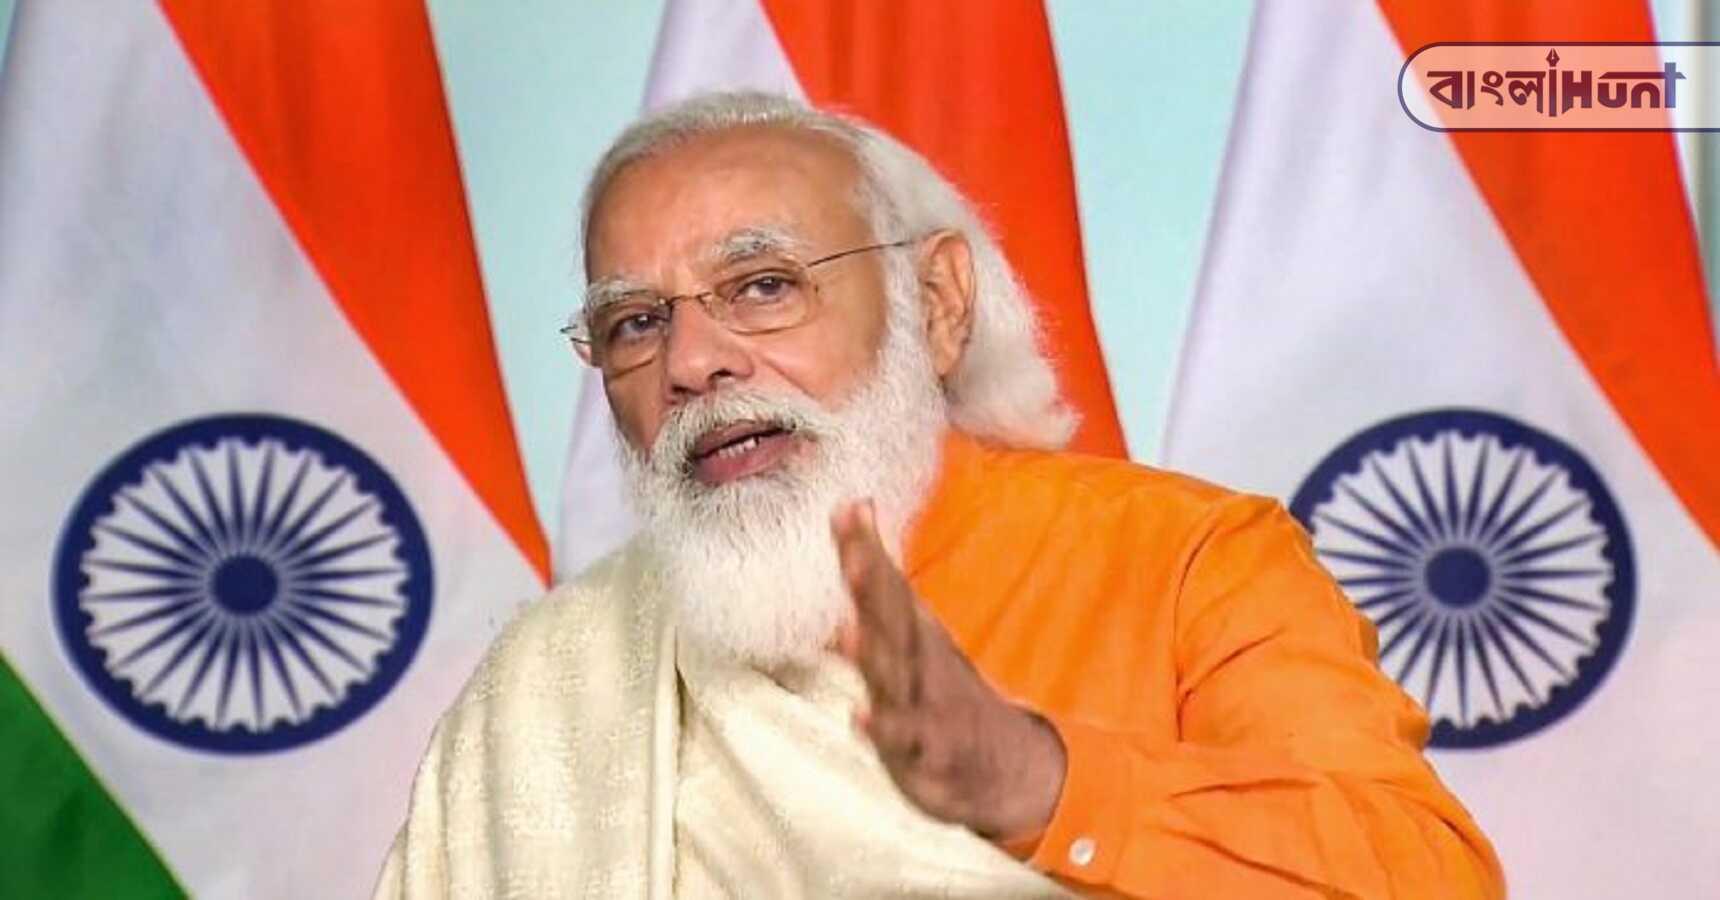 narendra modi speaks about toolkit on visva bharati university